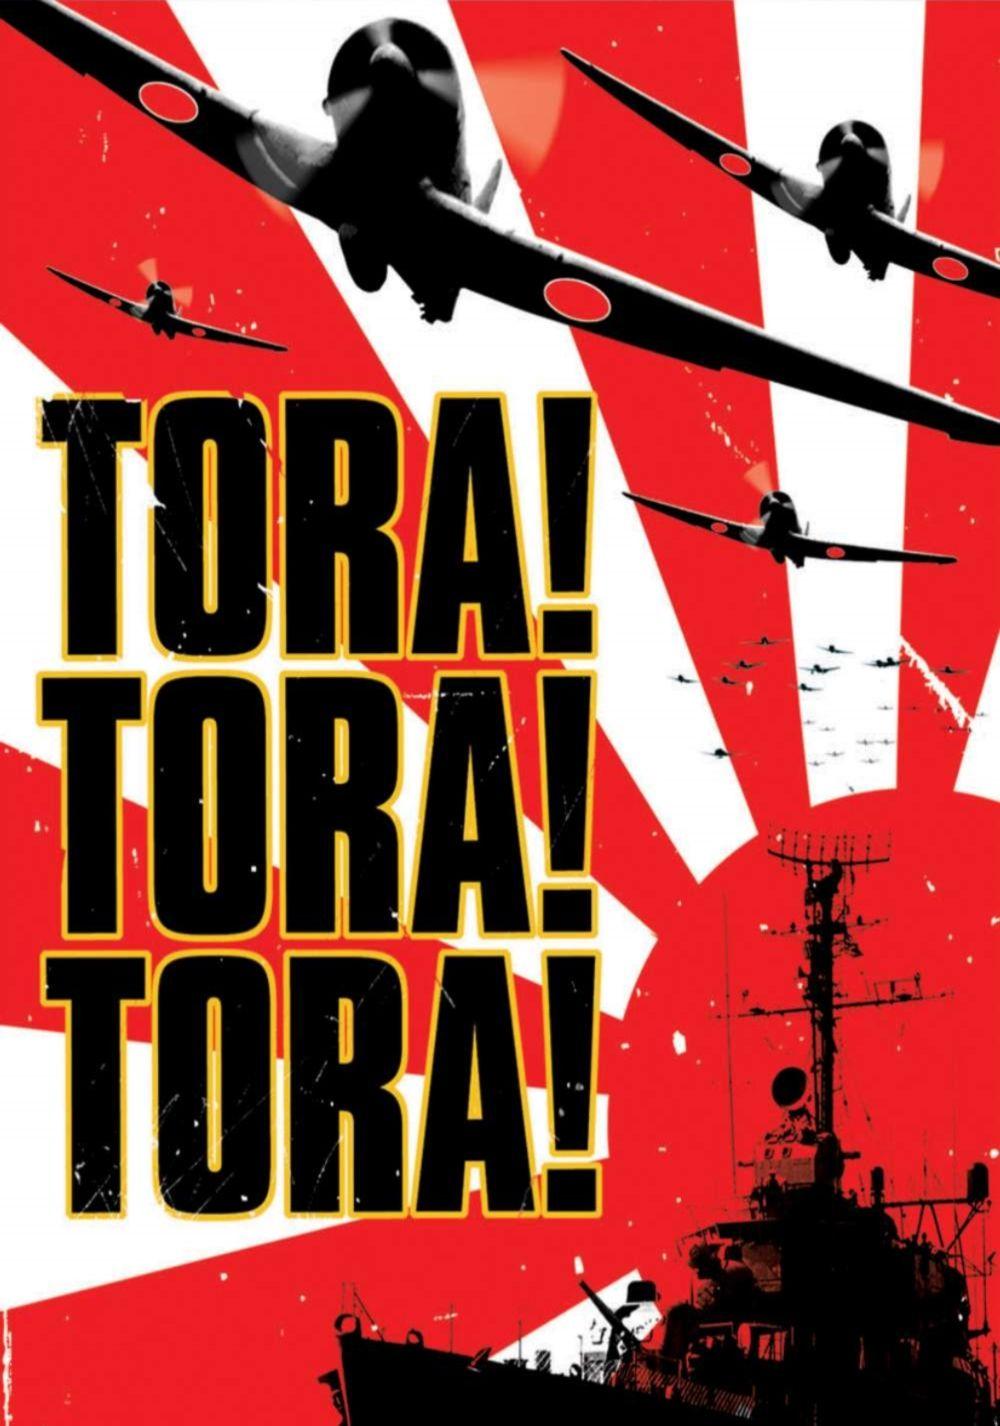 Tora! Tora! Tora! (1970) - Ric...